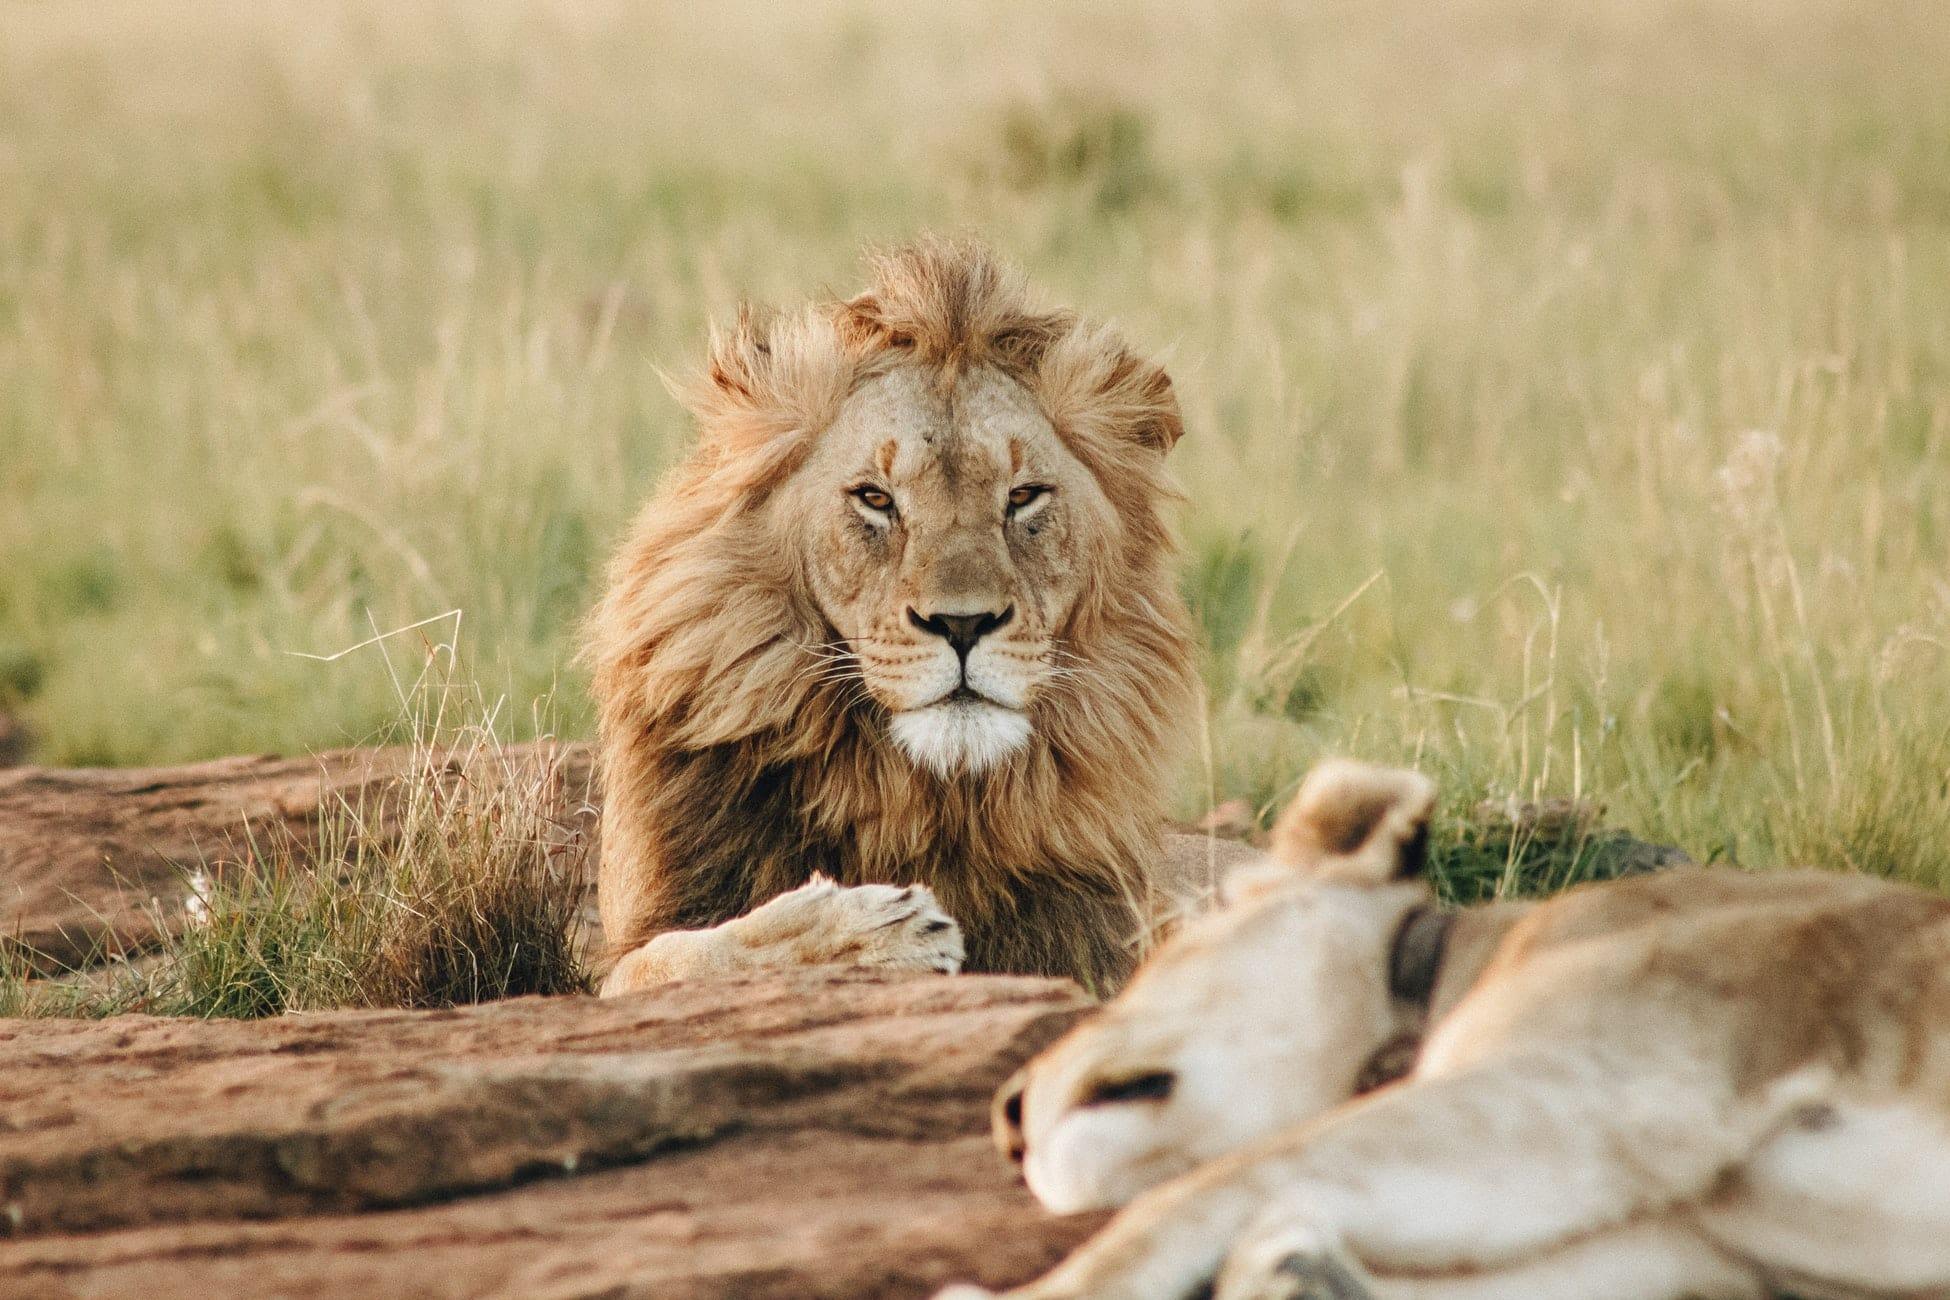 Löwe auf Safari im Krüger Nationalpark in Südafrika